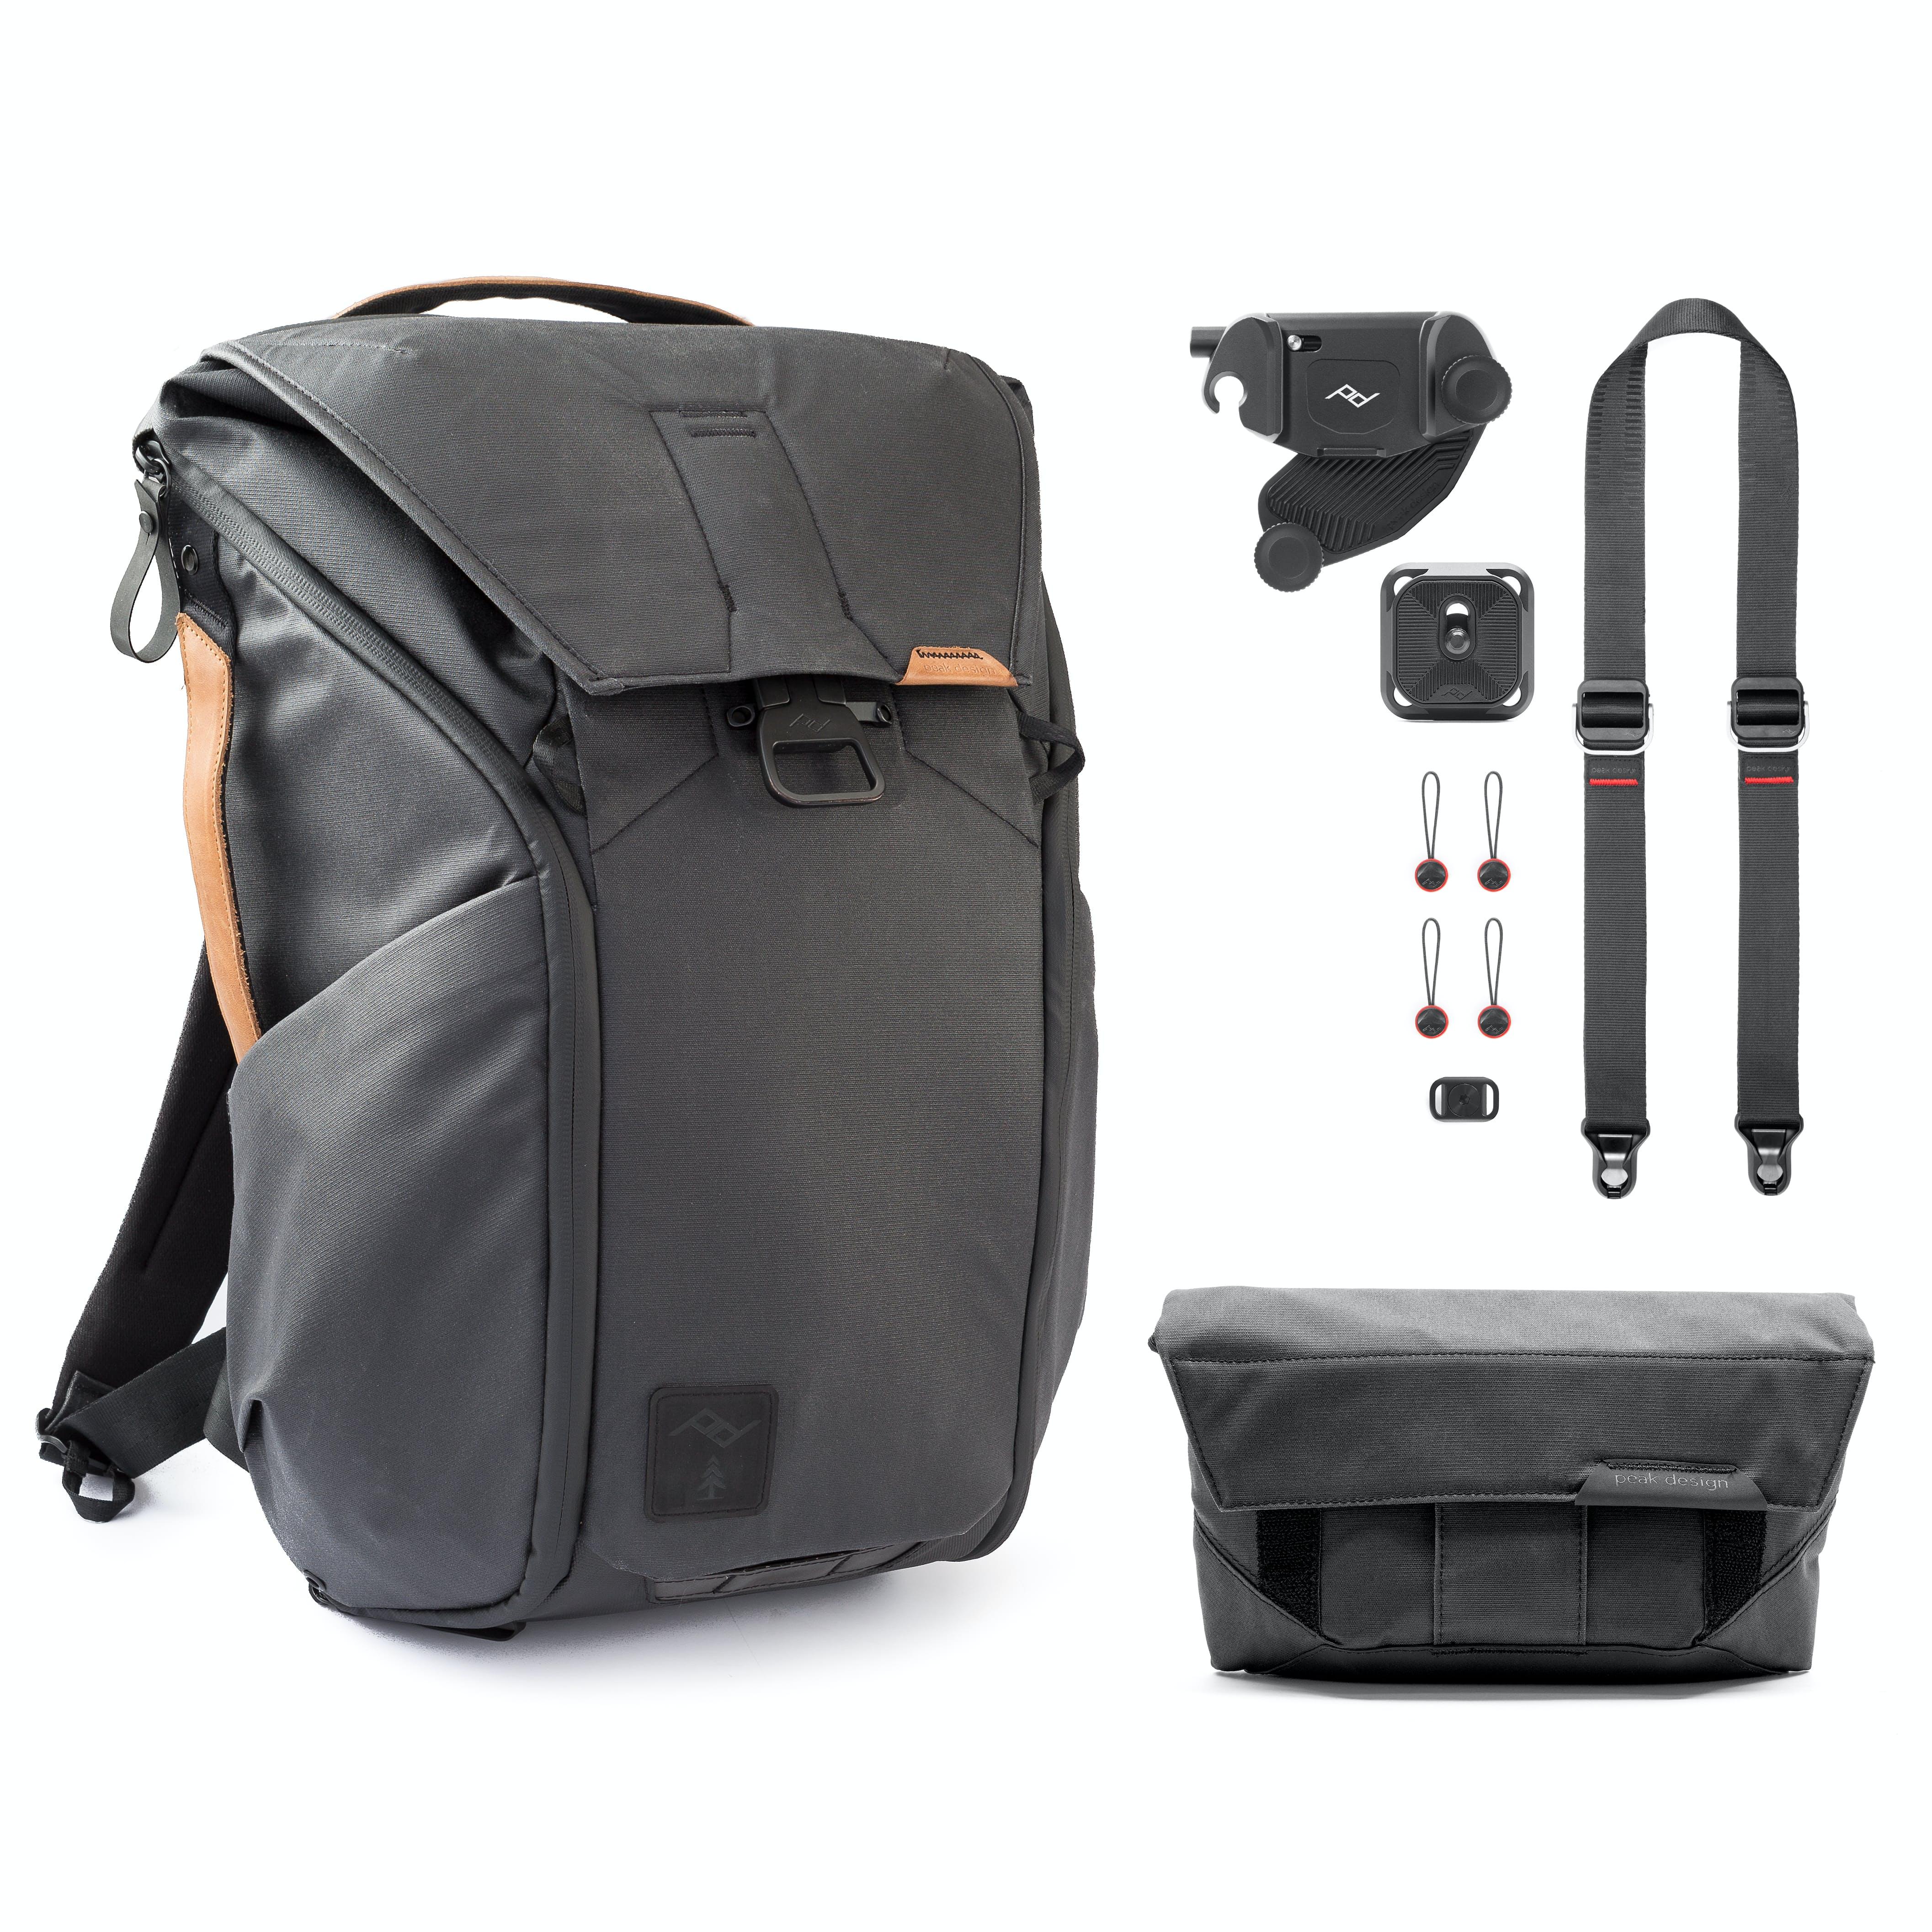 Gj8i94fsas peak design huckberry camera bundle exclusive 0 original